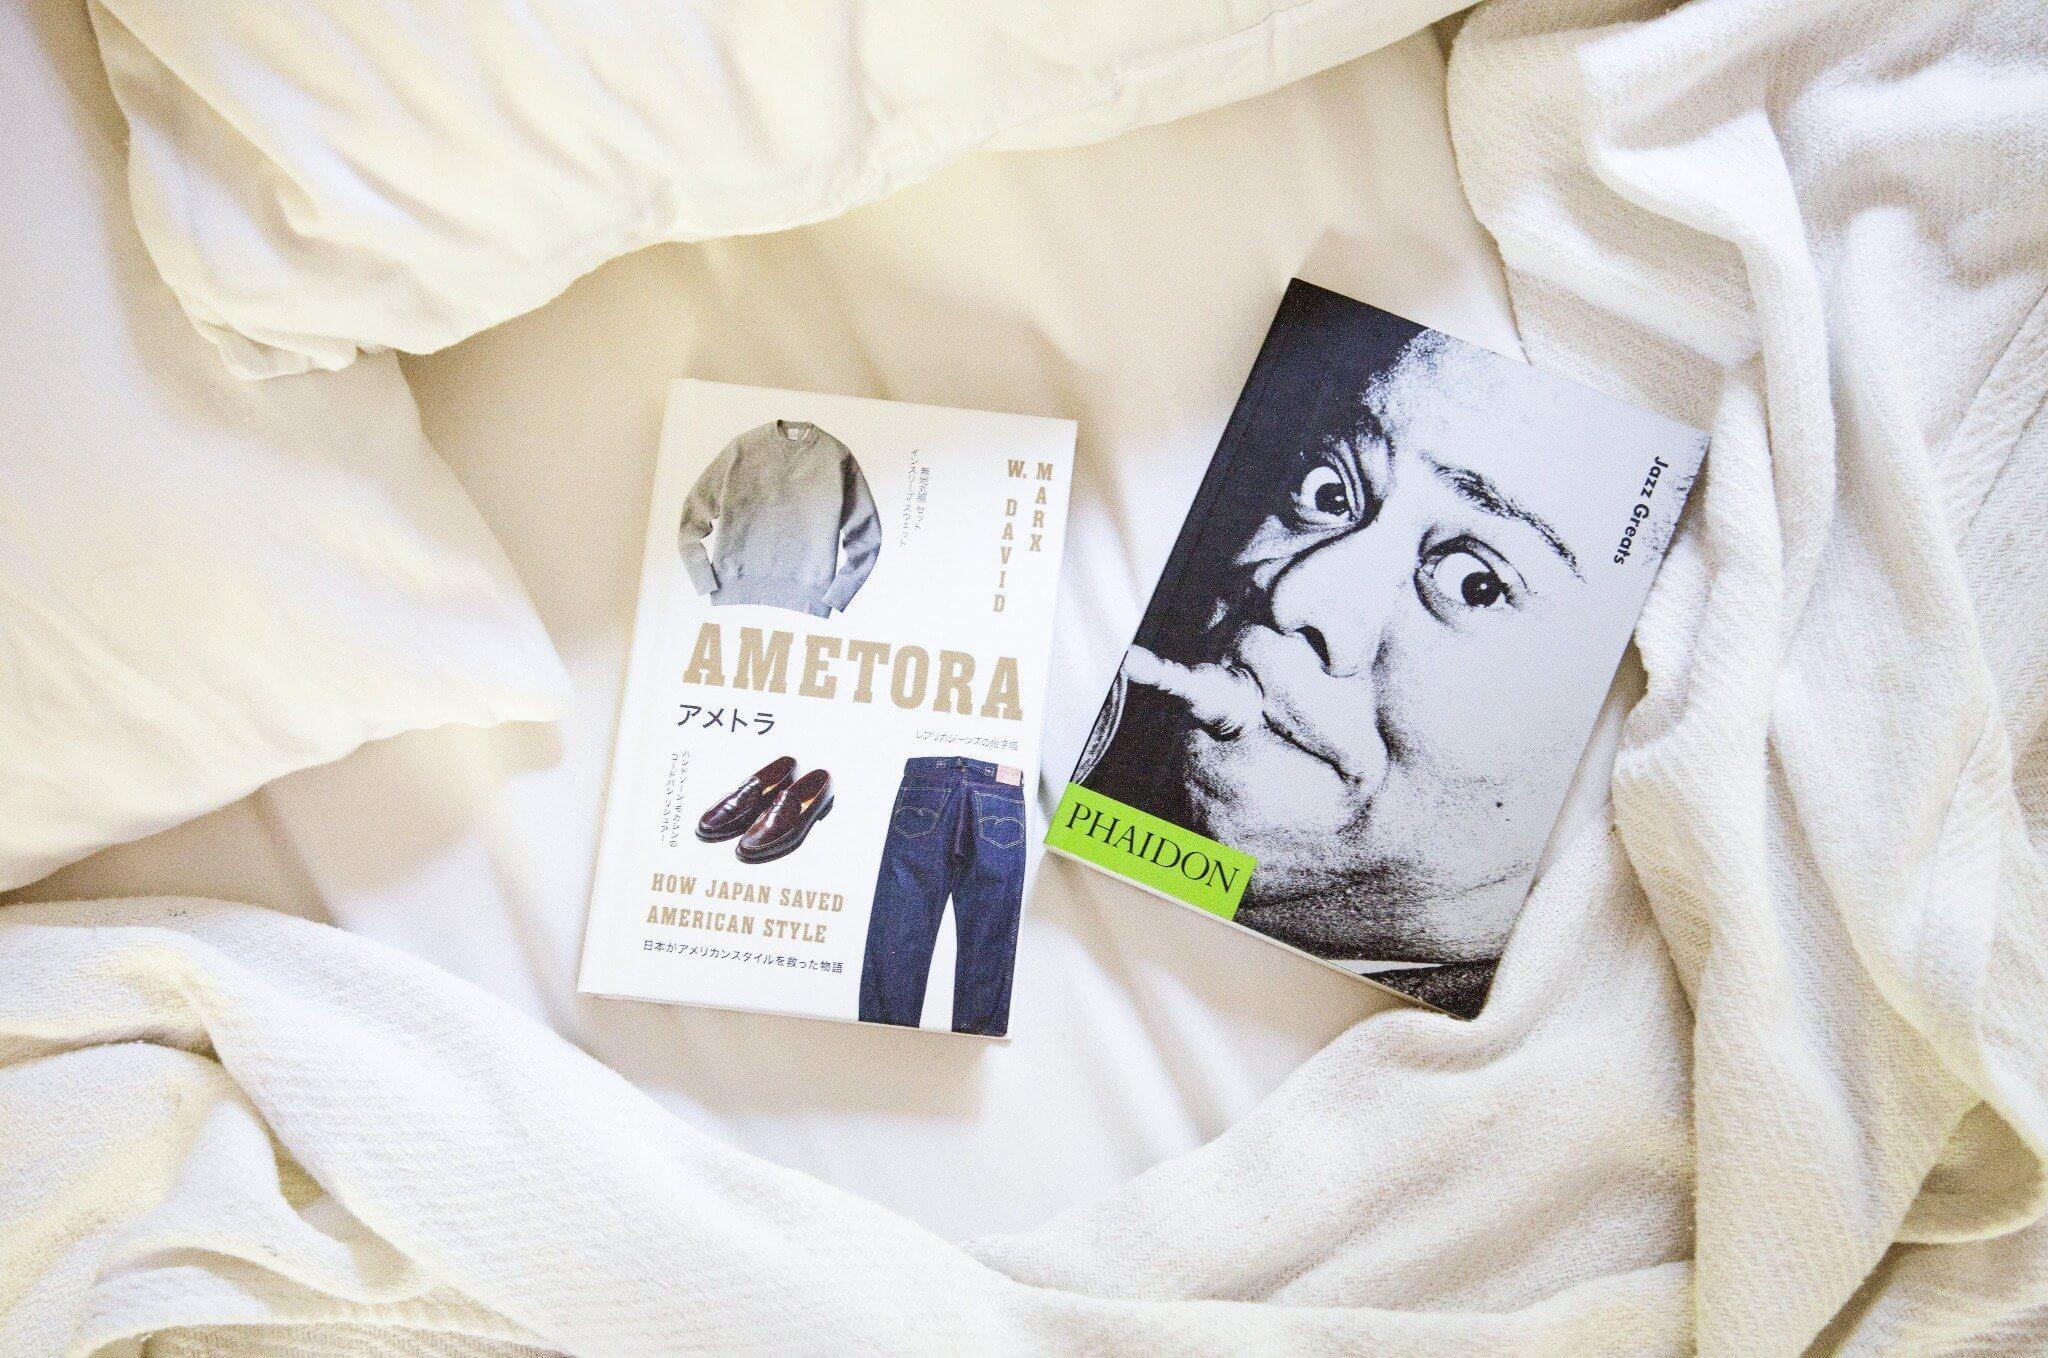 ametora book and jazz greats phaidon book